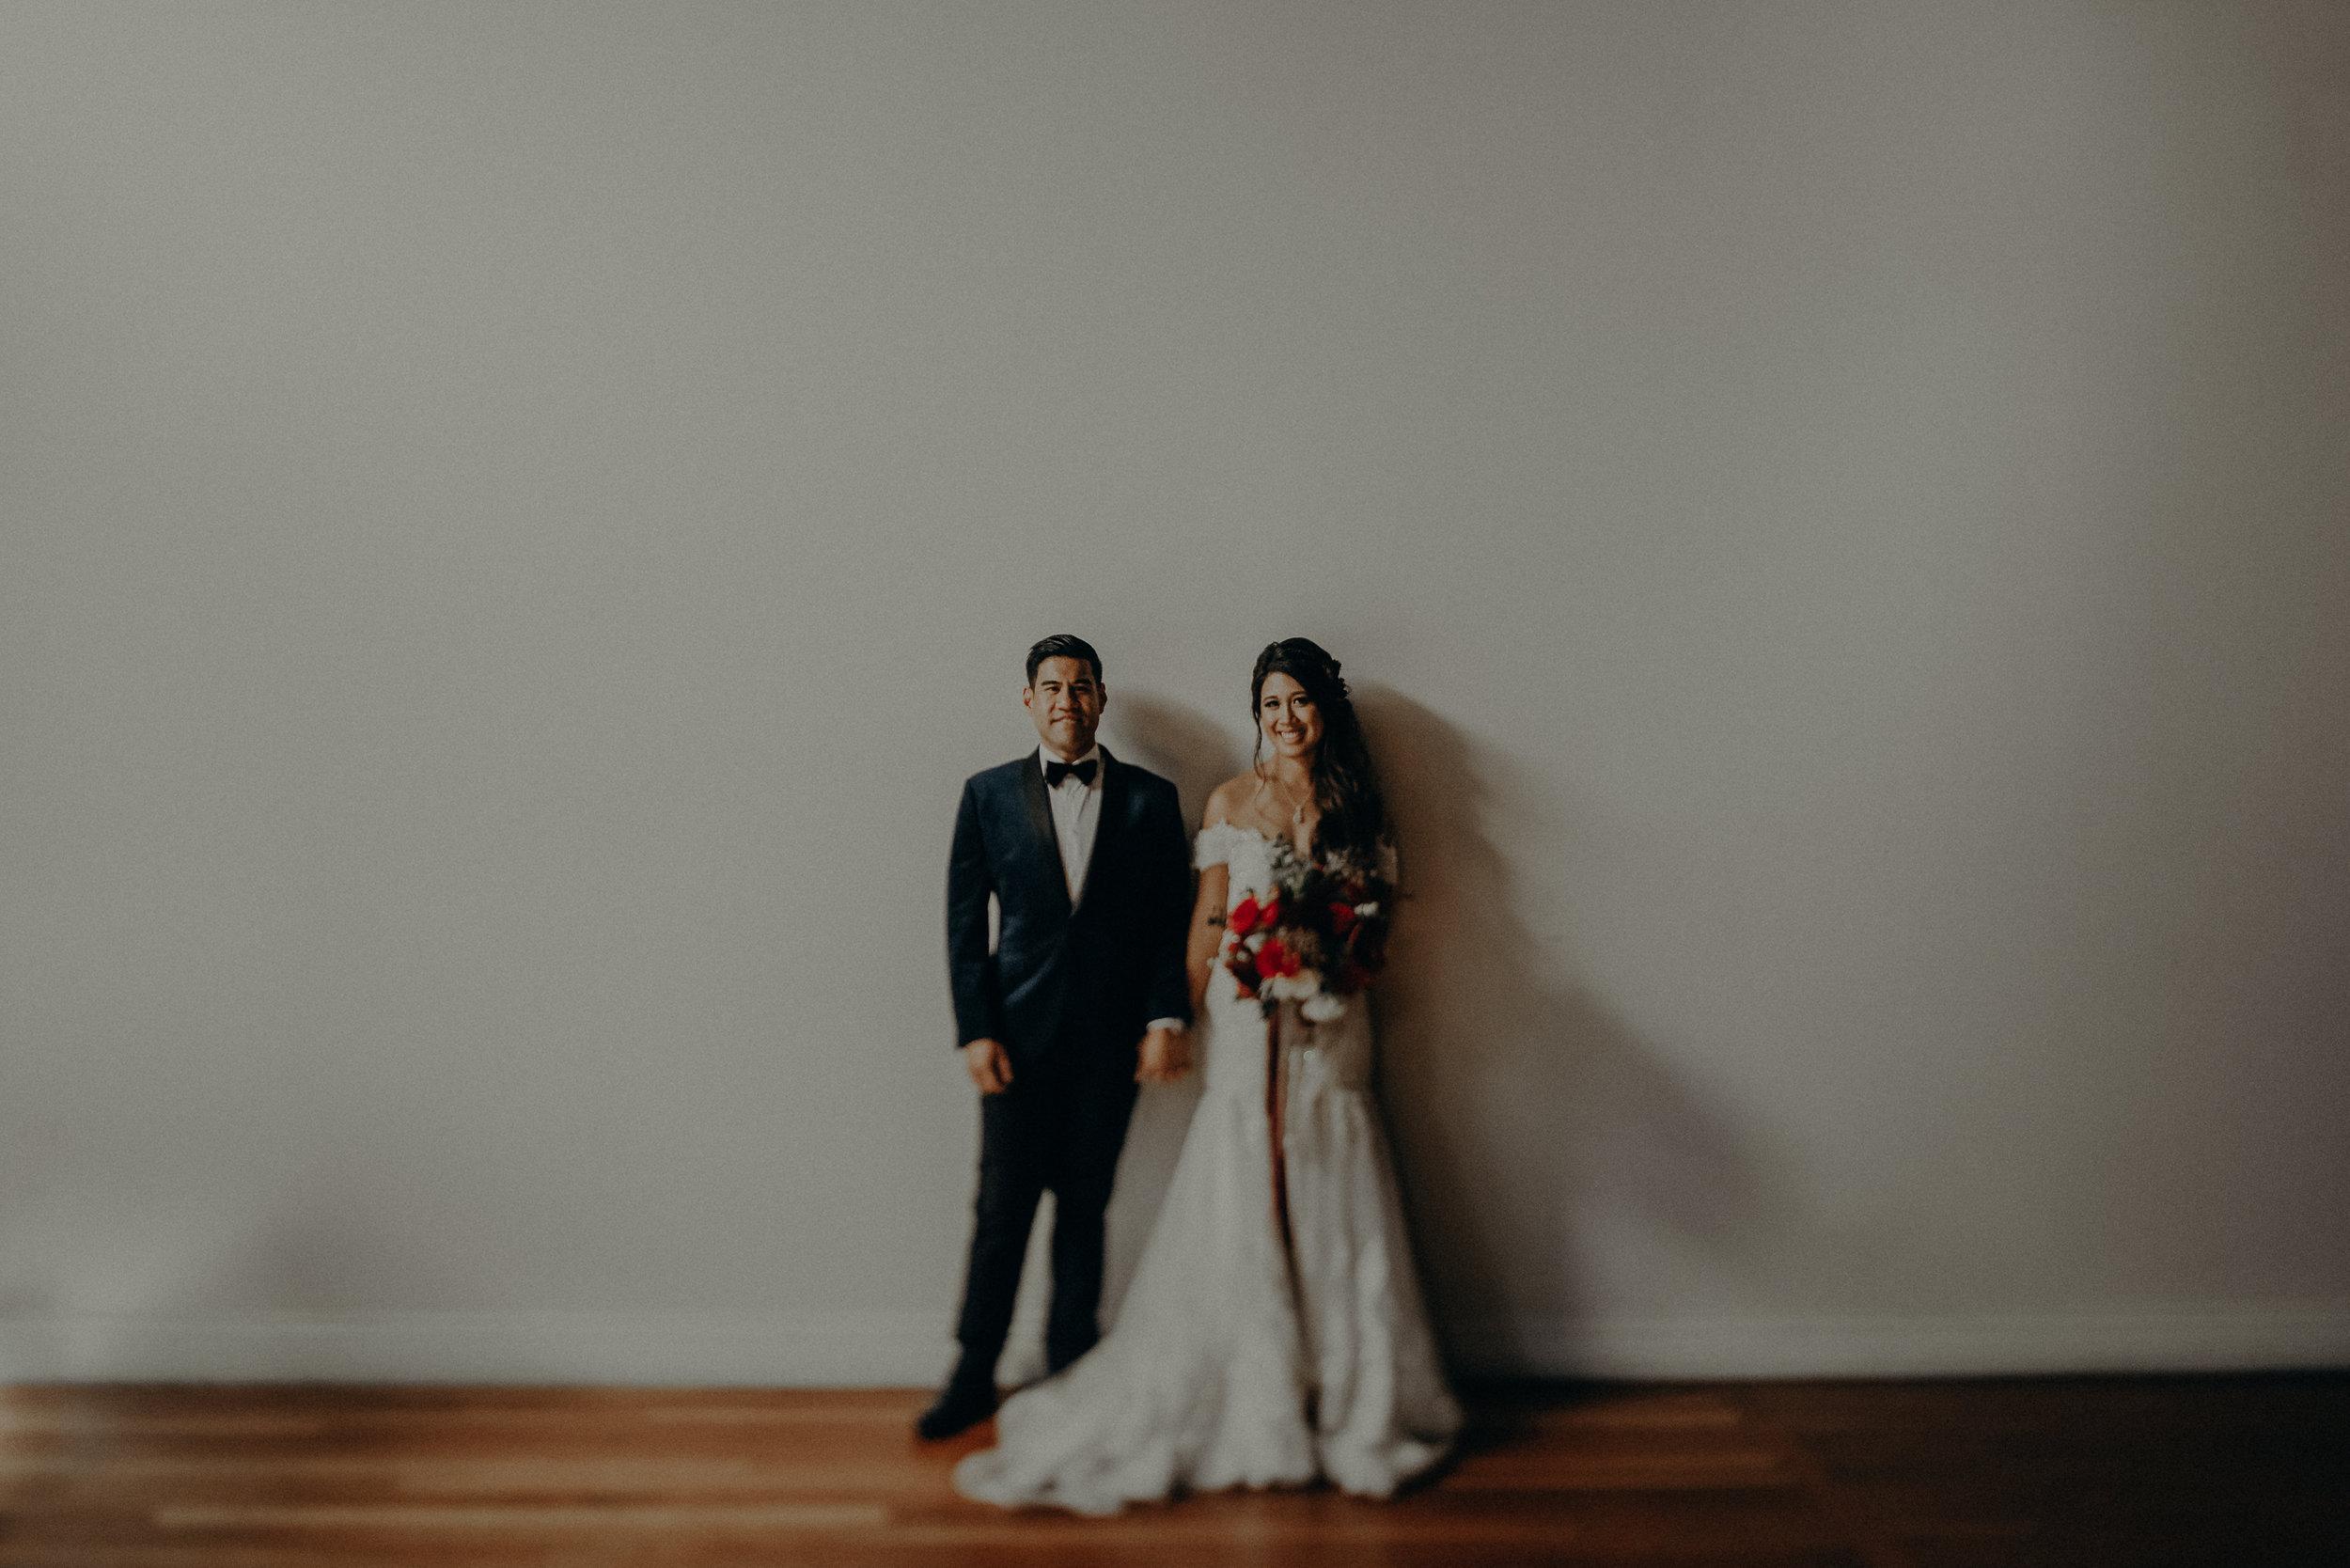 ©Isaiah + Taylor Photography - the Loft on Pine Wedding, Long Beach Wedding Photographer-113.jpg